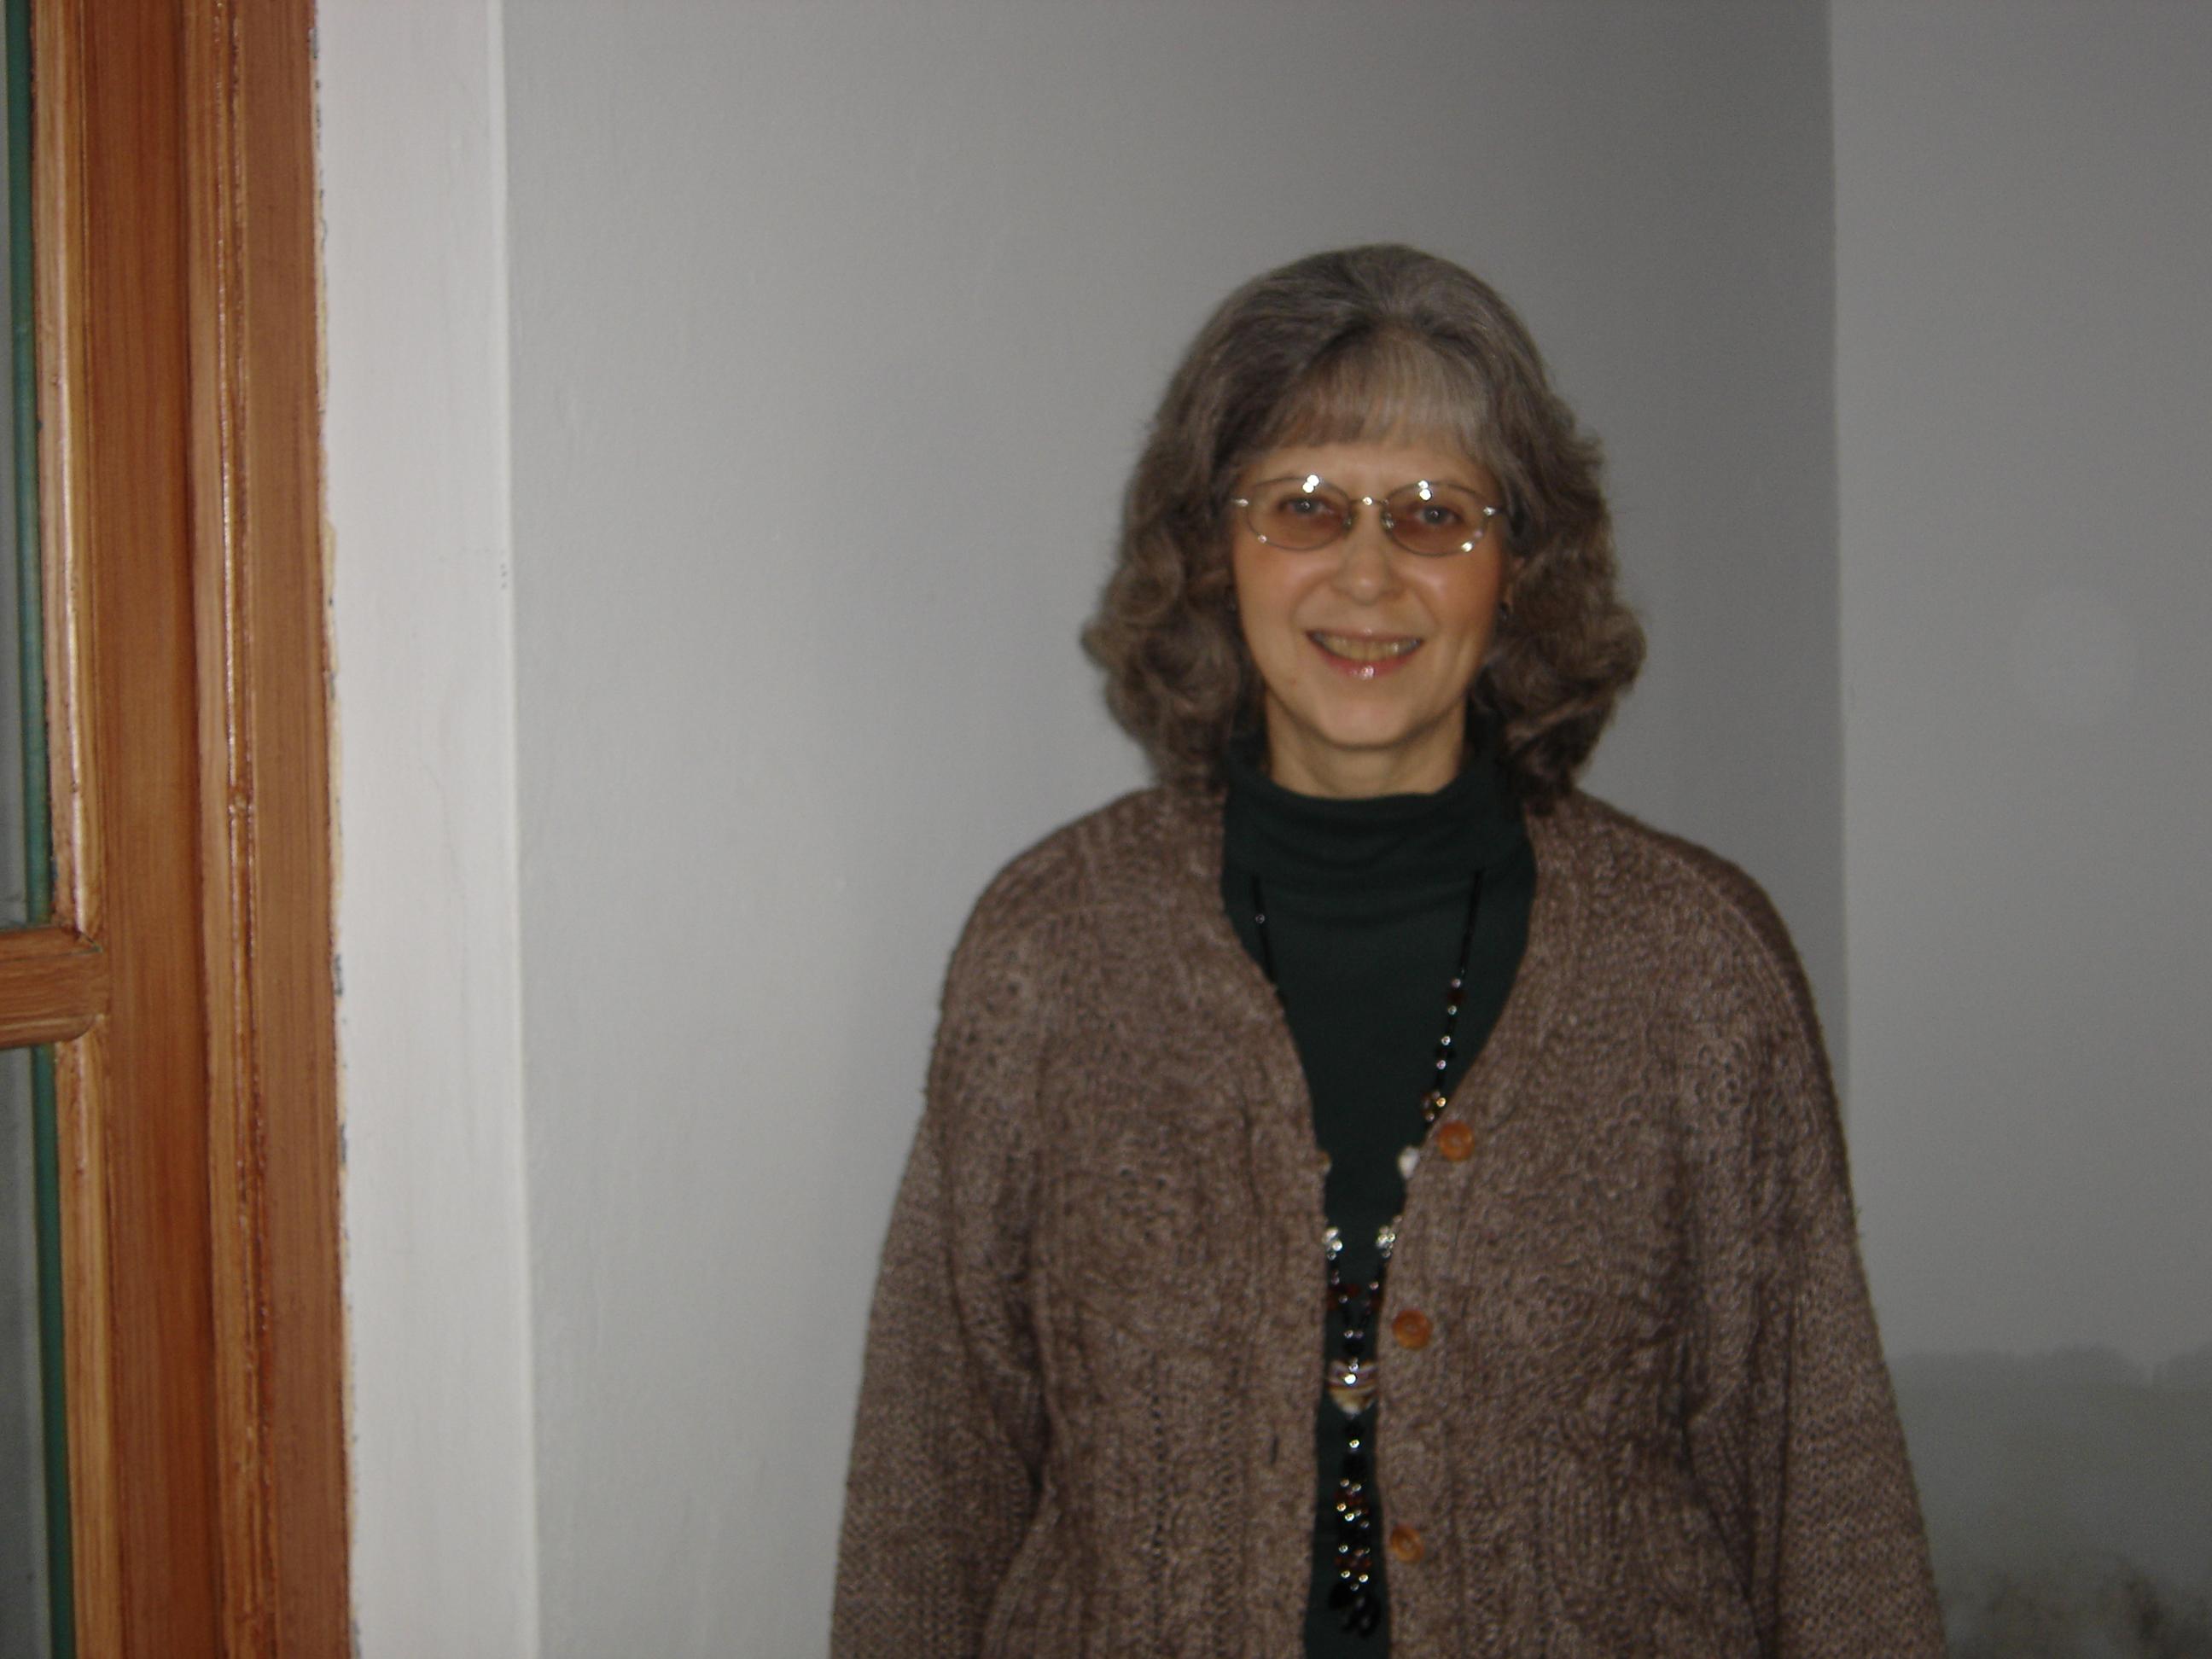 Lois Kenney